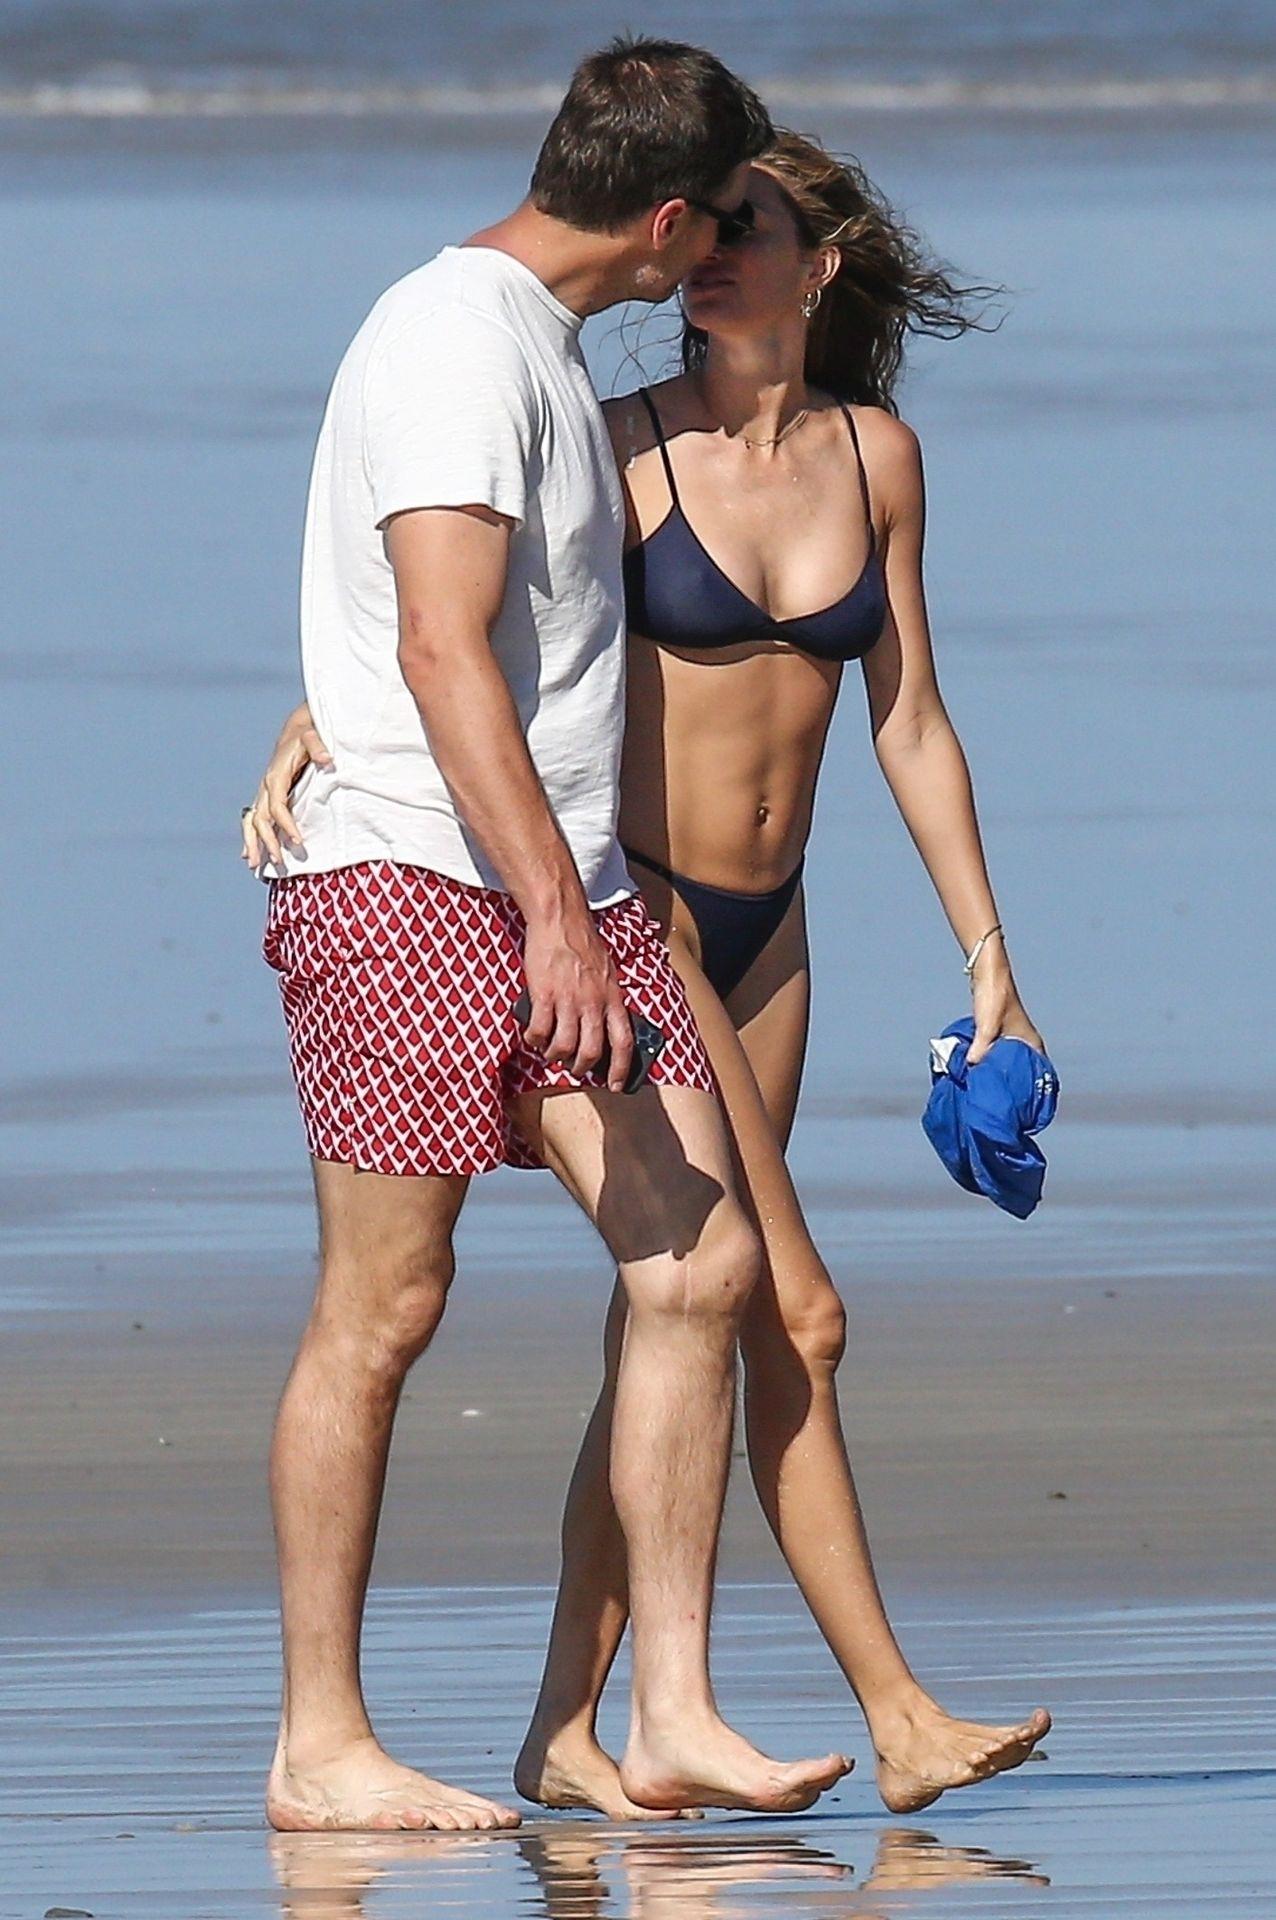 Tom Brady & Gisele Bundchen Pack On The Pda At The Beach 0027